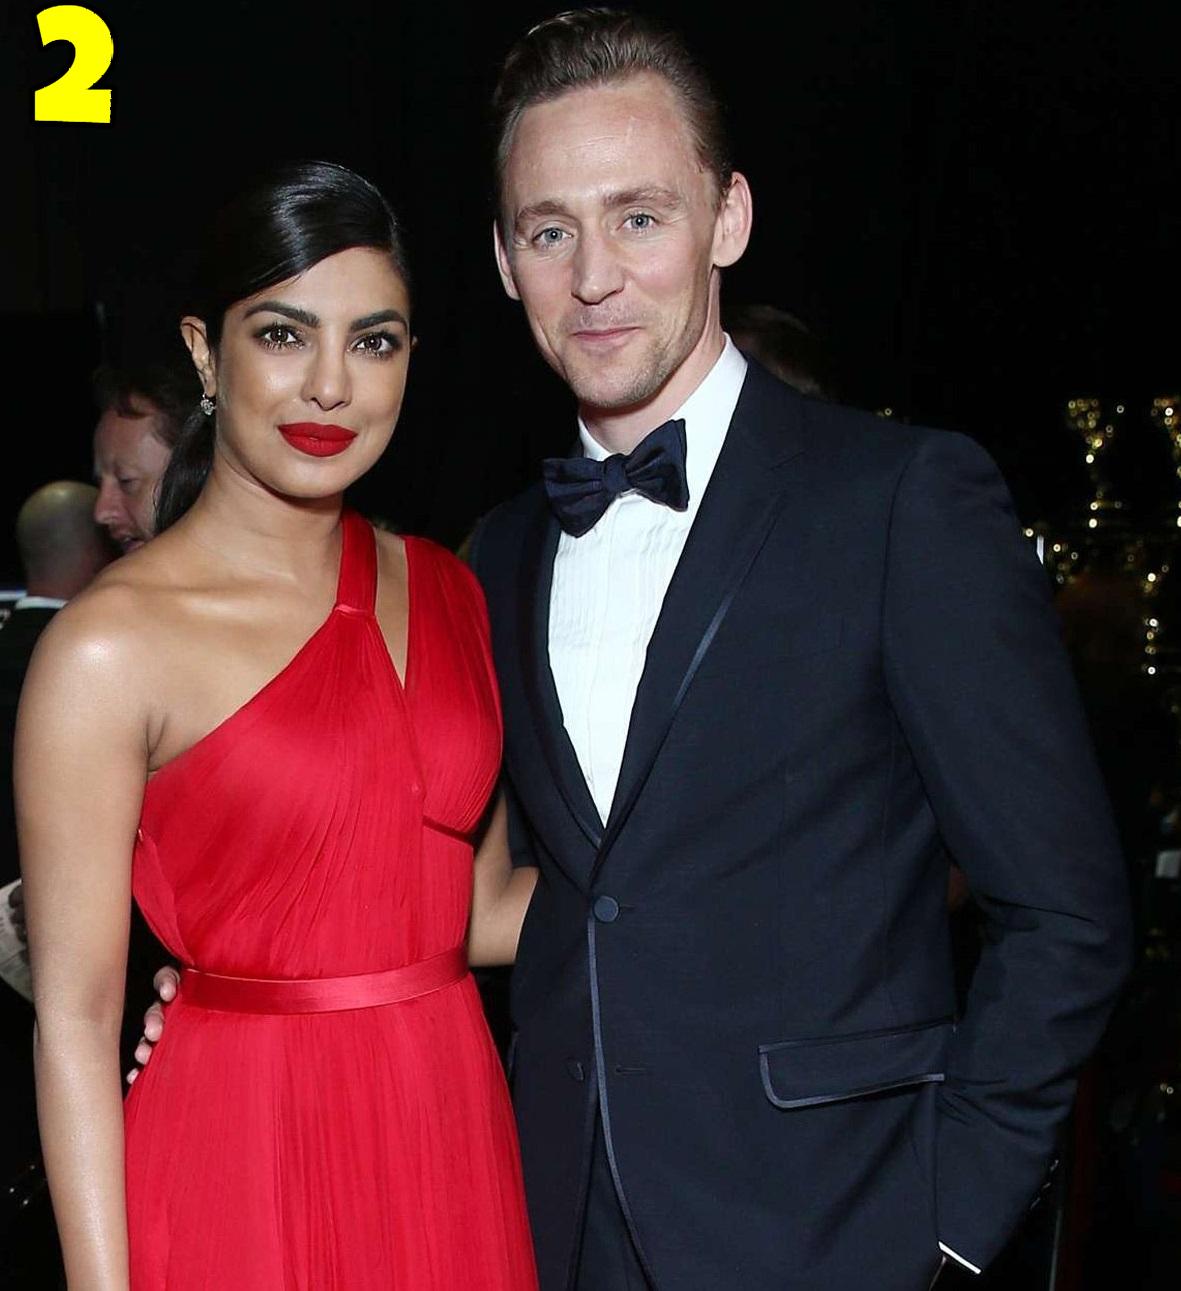 Tom Hiddleston And Priyanka Chopra Dating